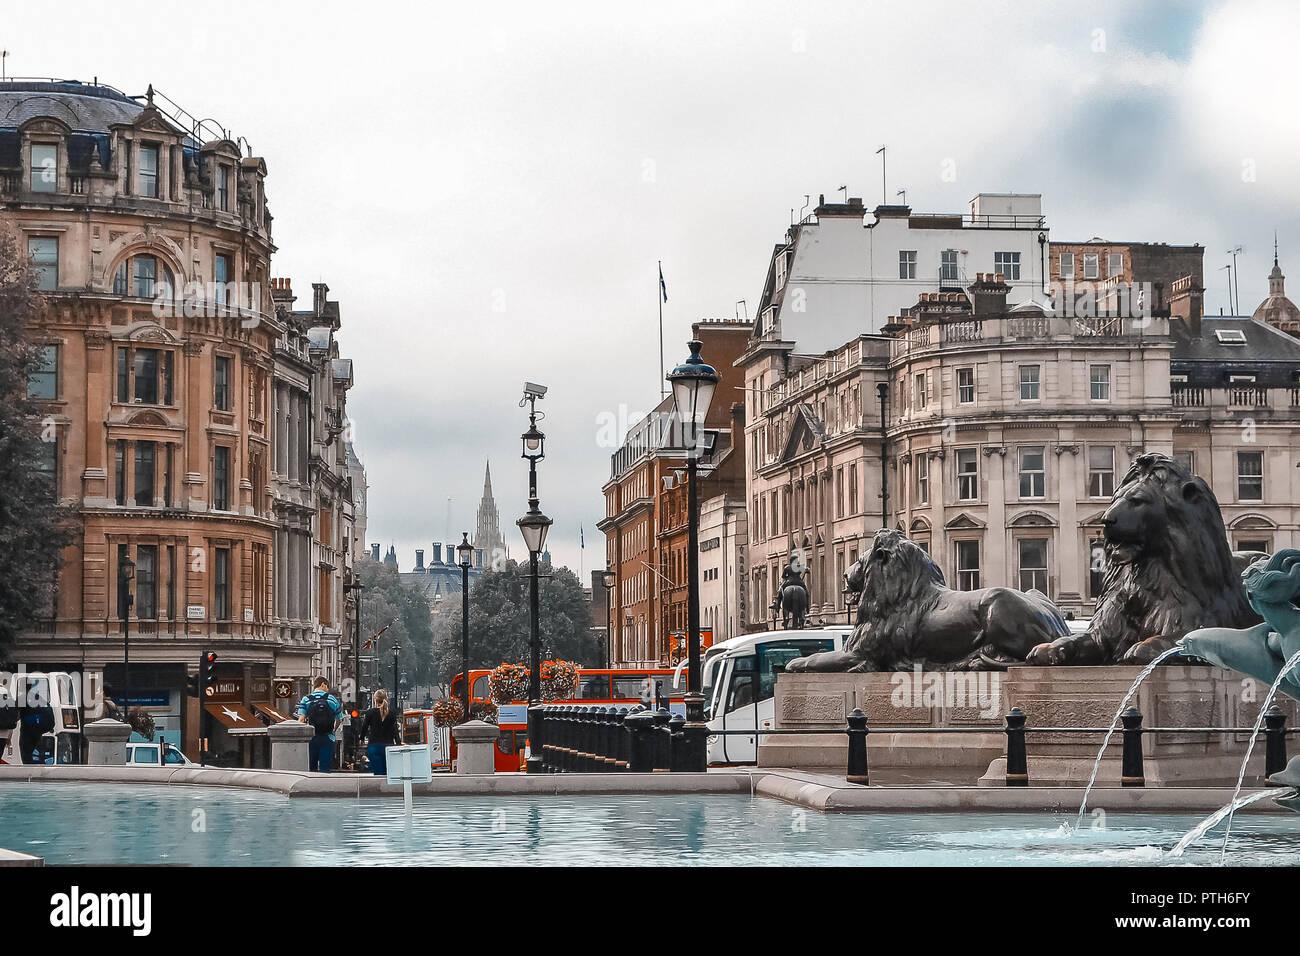 London, UK, September 20, 2014, a rainy morning. Lions in Trafalgar Square. Stock Photo